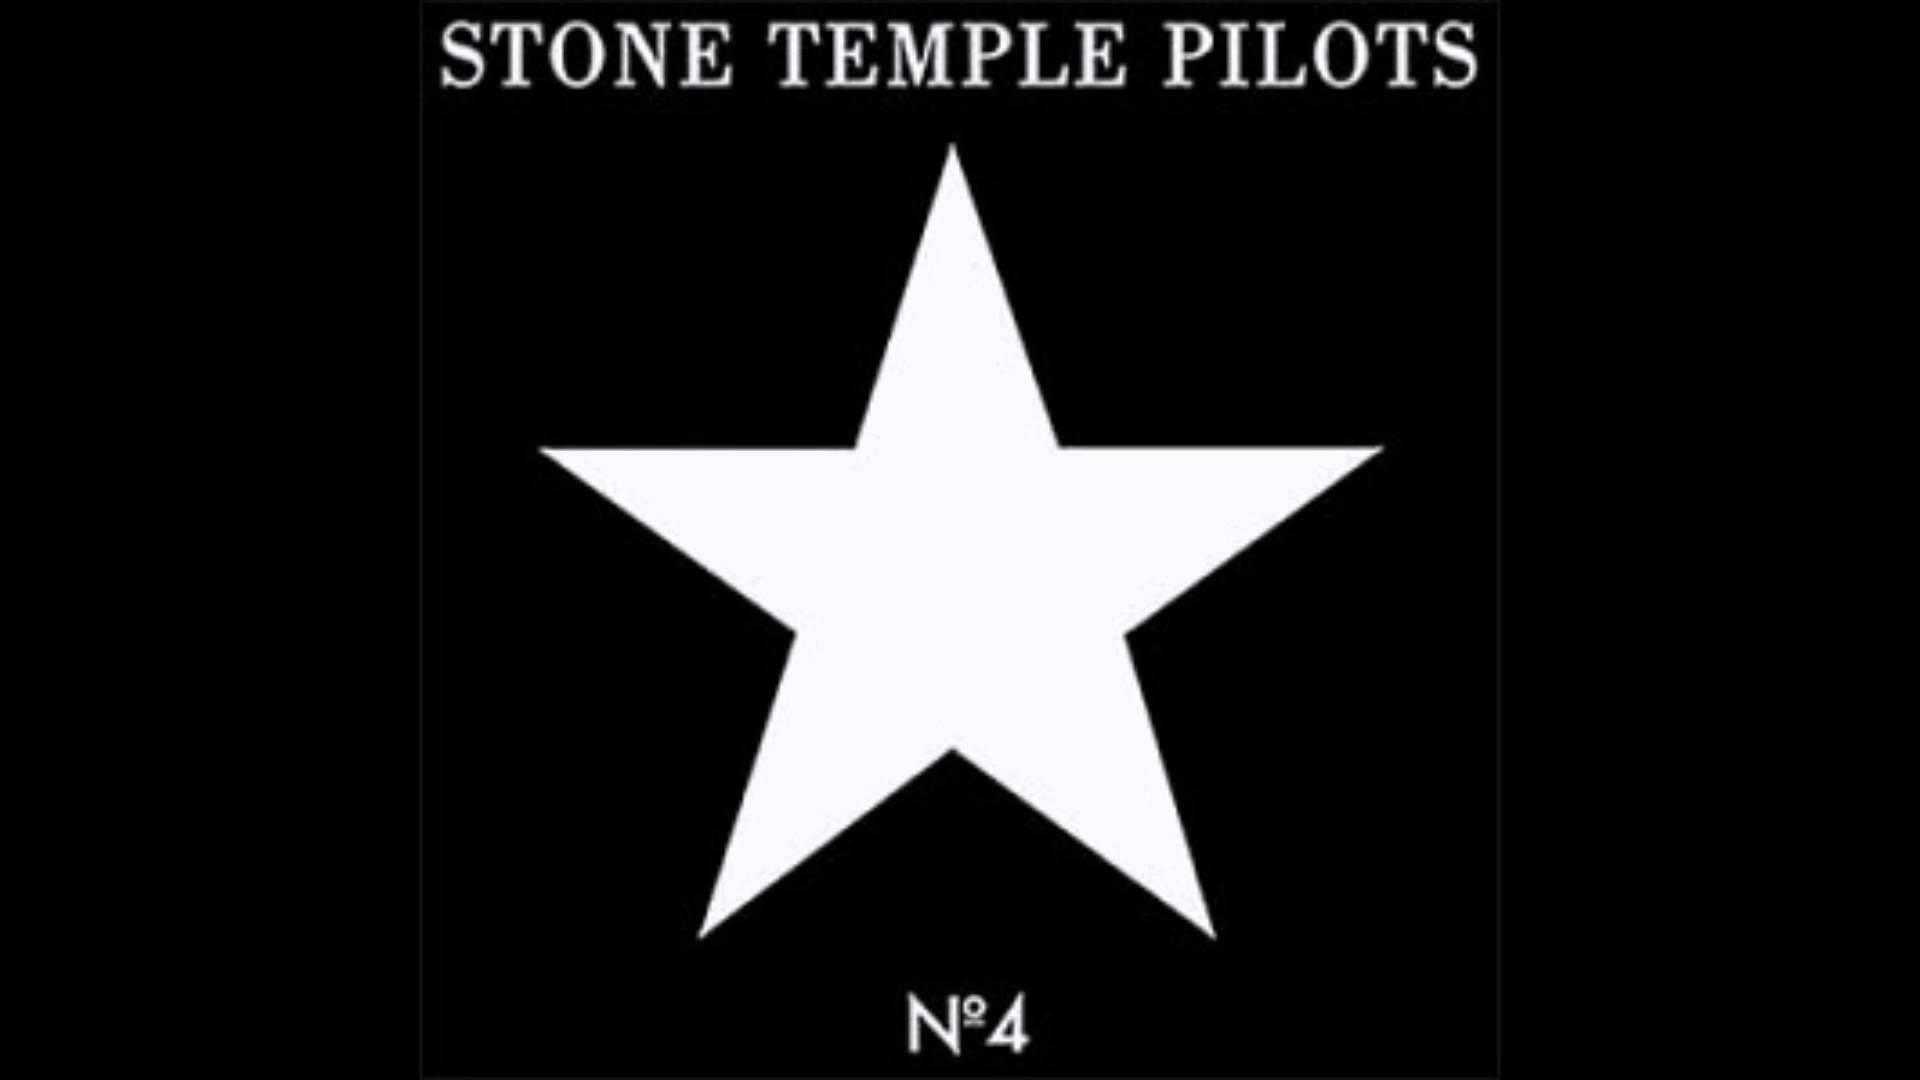 30 pics of stone temple pilots in hqfx